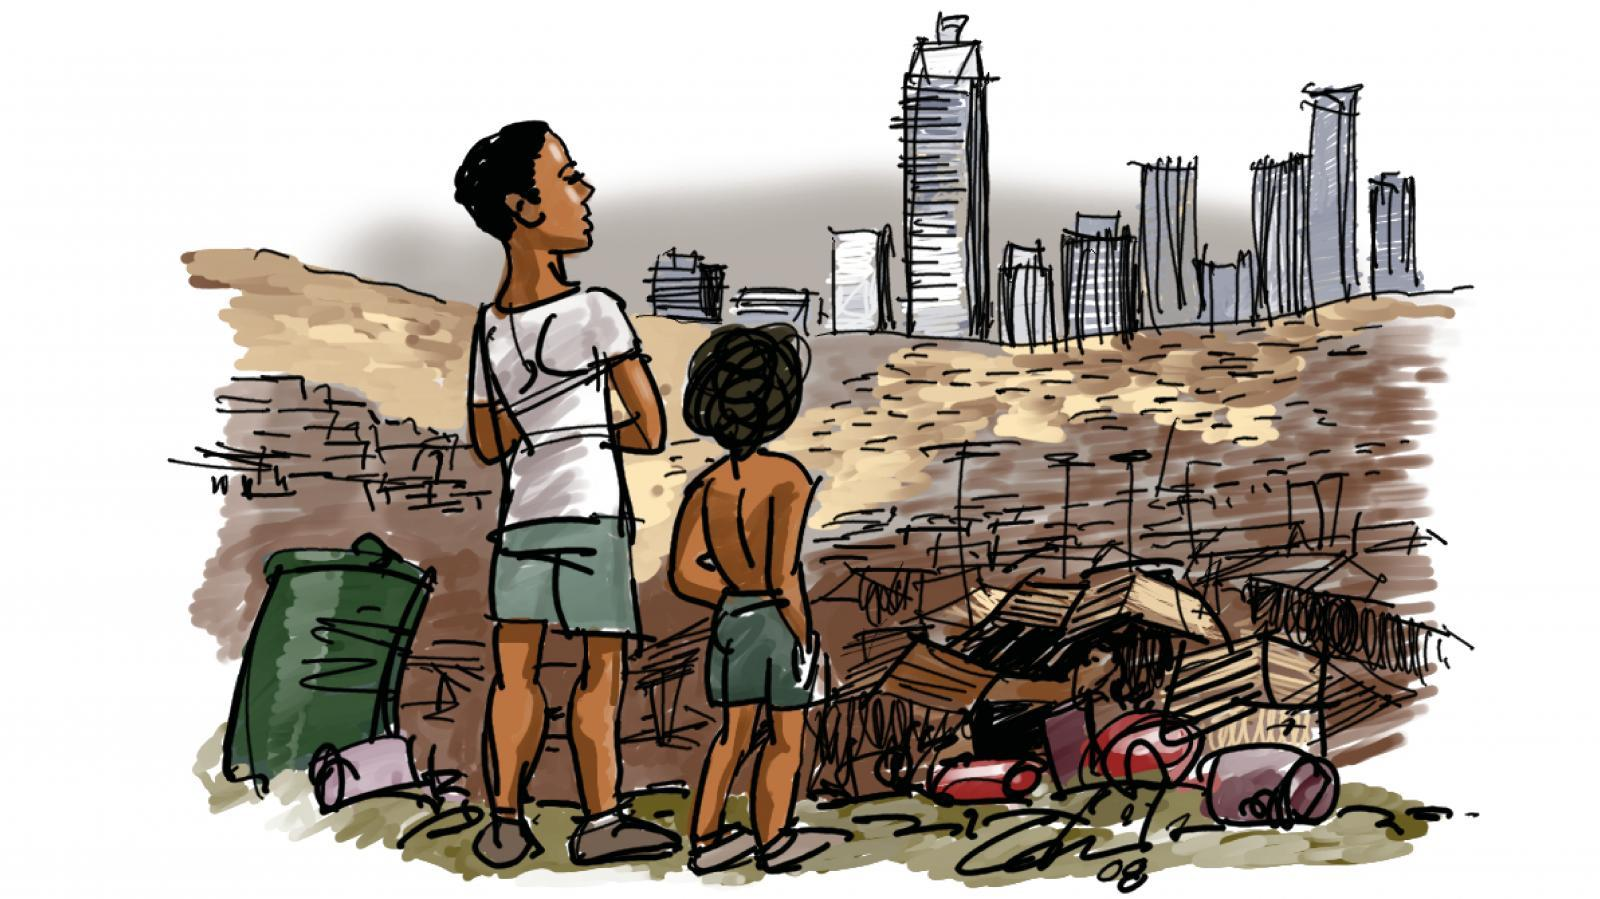 Opinião | Thomas Piketty – É hora de distribuir a riqueza